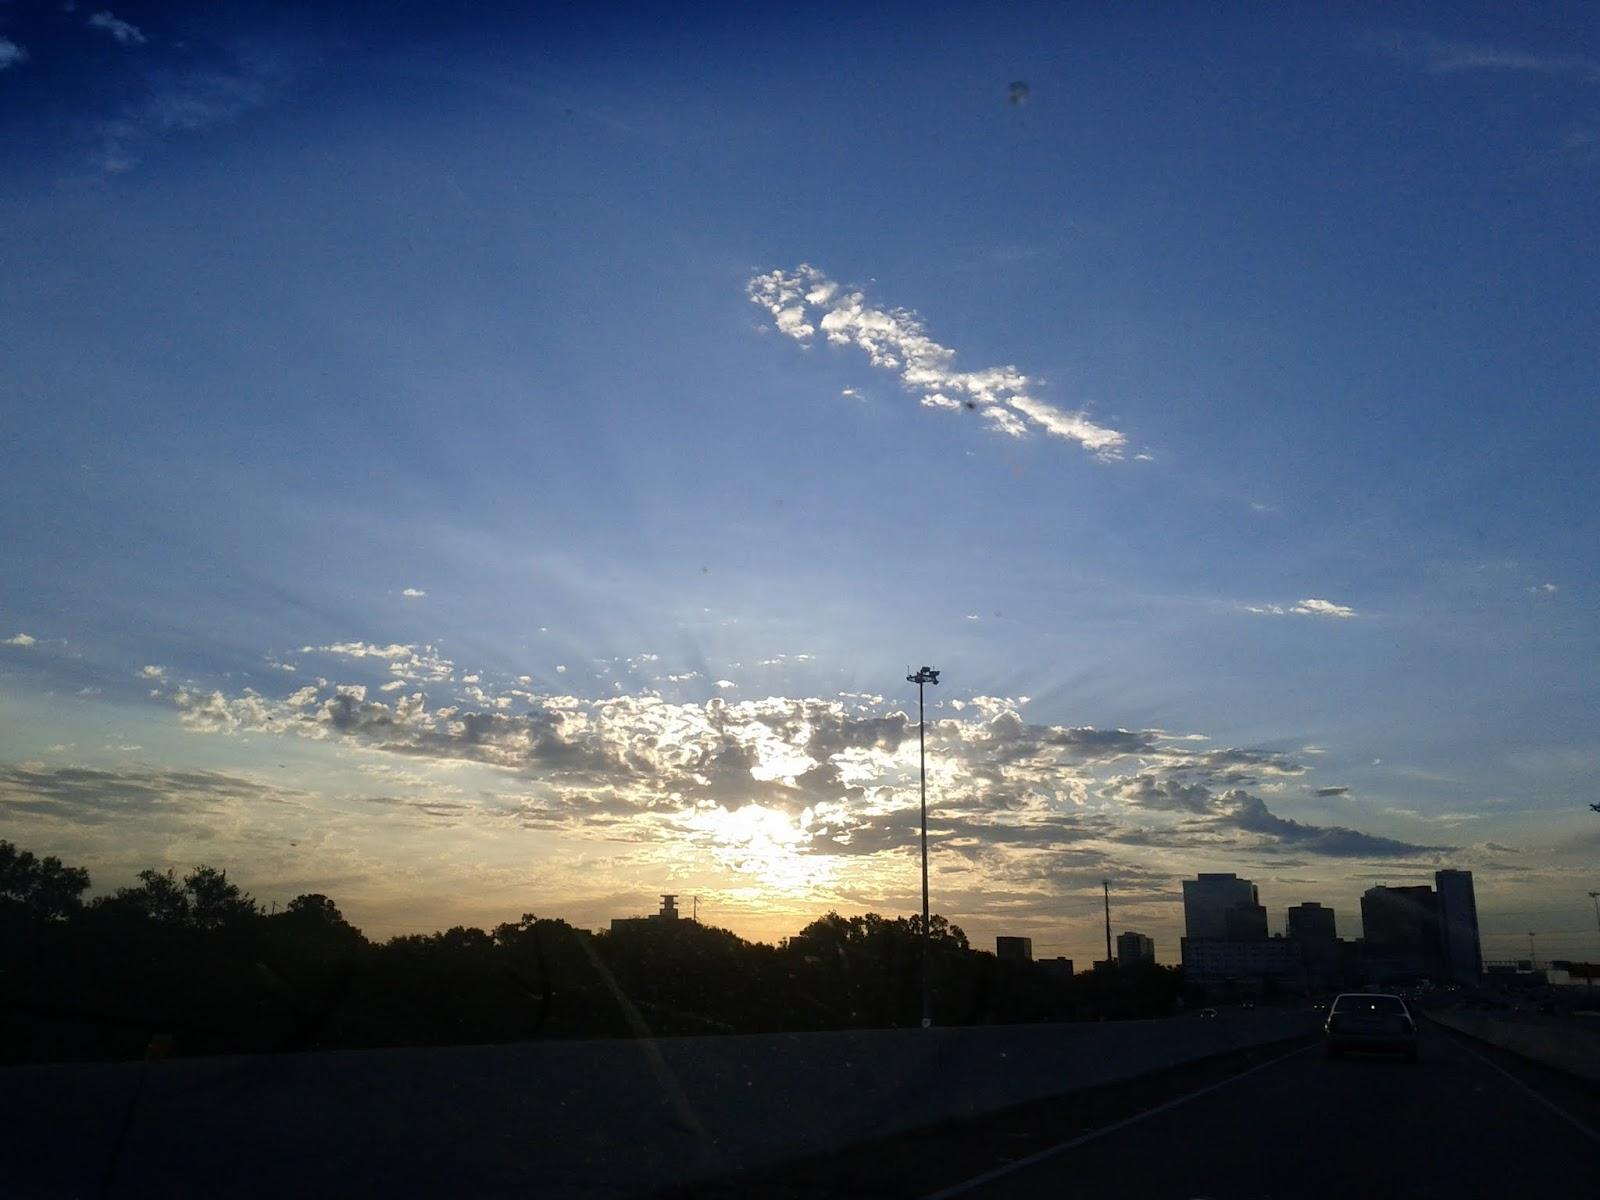 Sky - IMG_20110708_065850.jpg